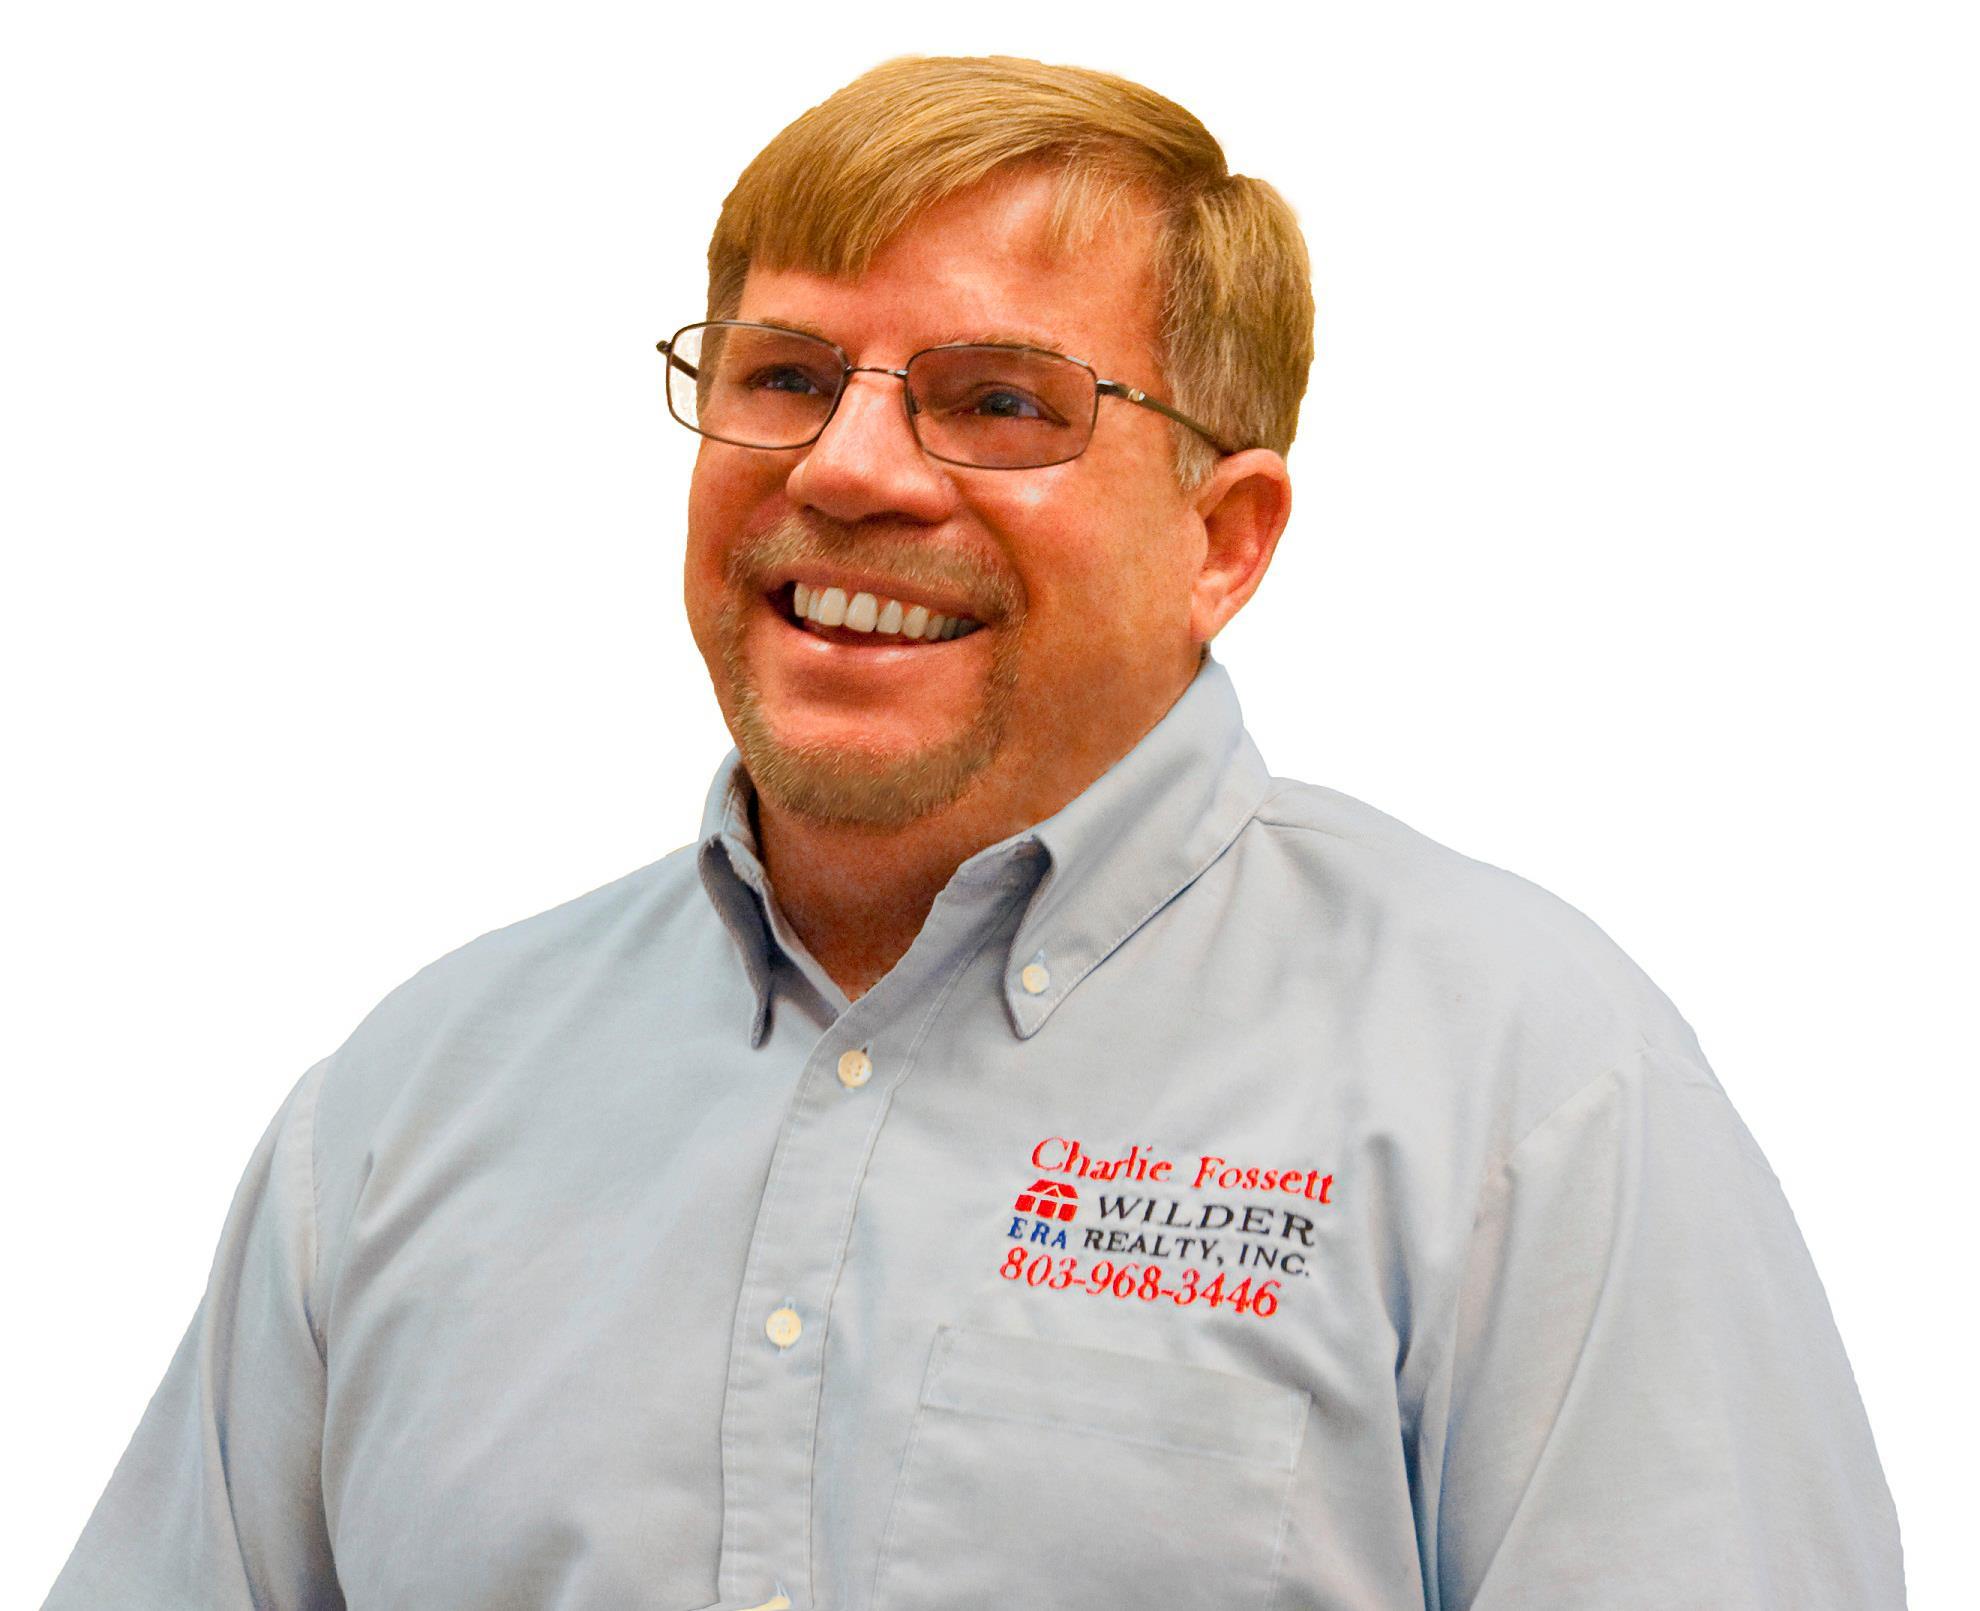 South Carolina's Top Rated Local® Real Estate Brokers Award Winner: Charlie Fossett